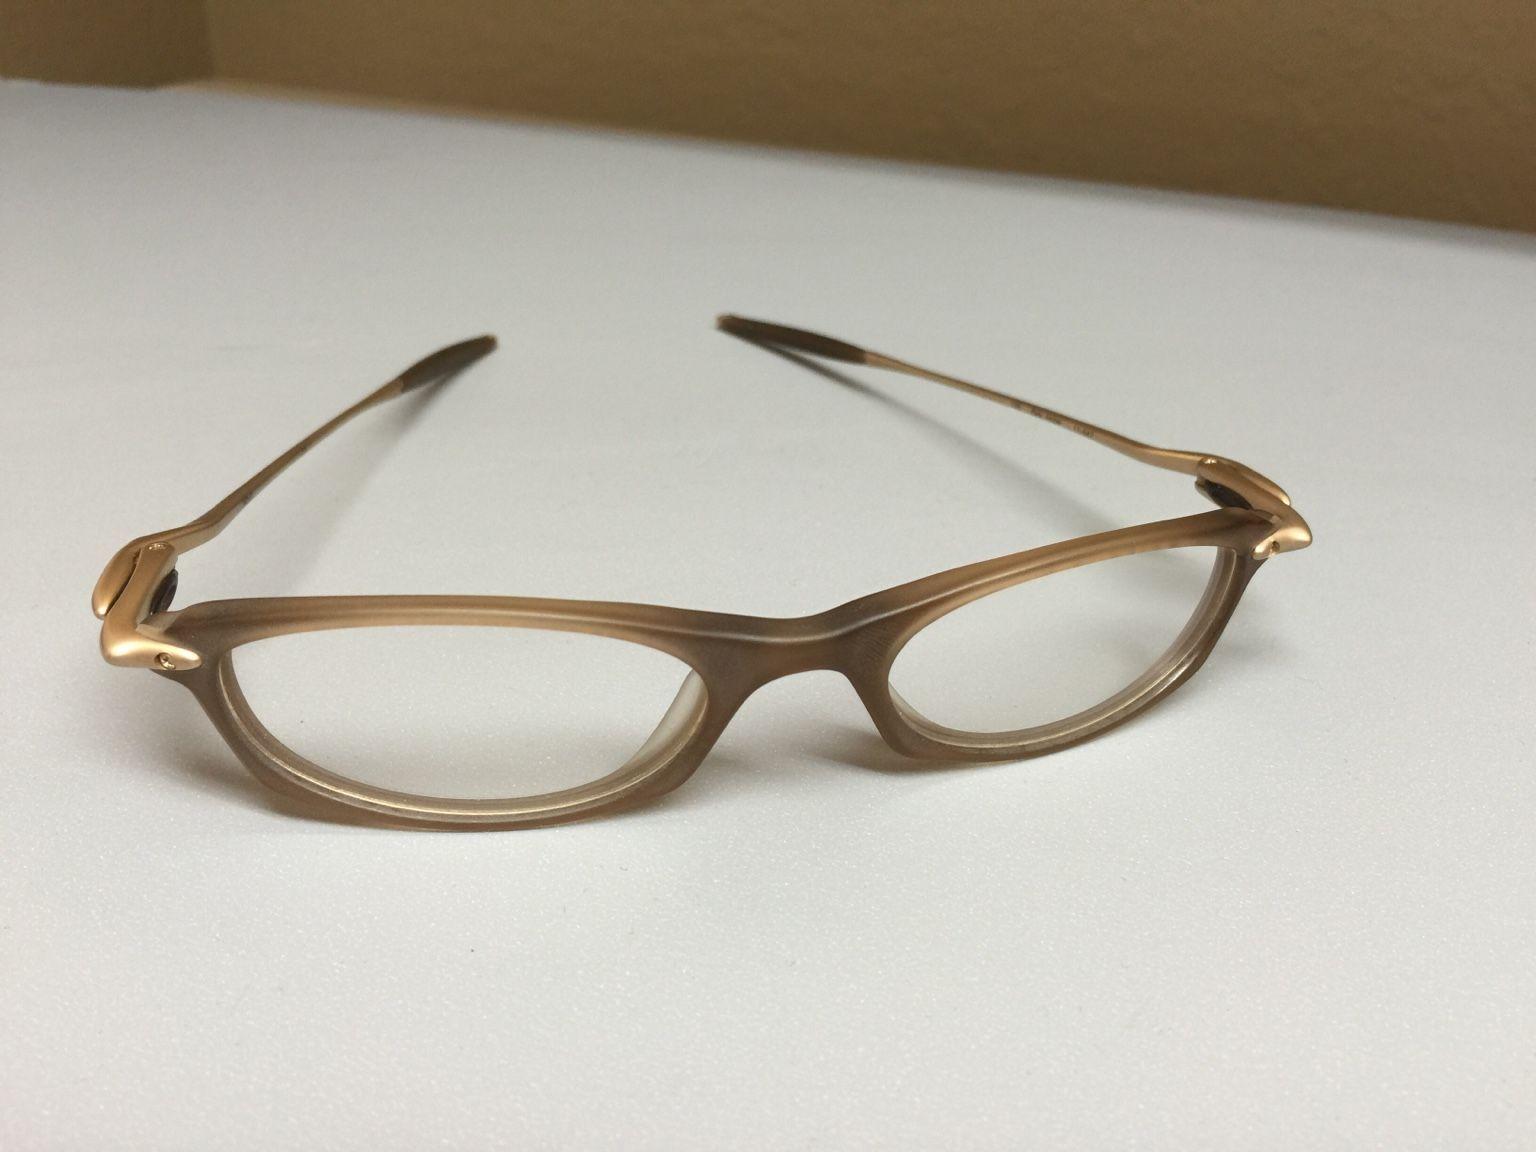 Oakley prescription frames woes - 66a28a710243d0e4c37acd79e7282106.jpg